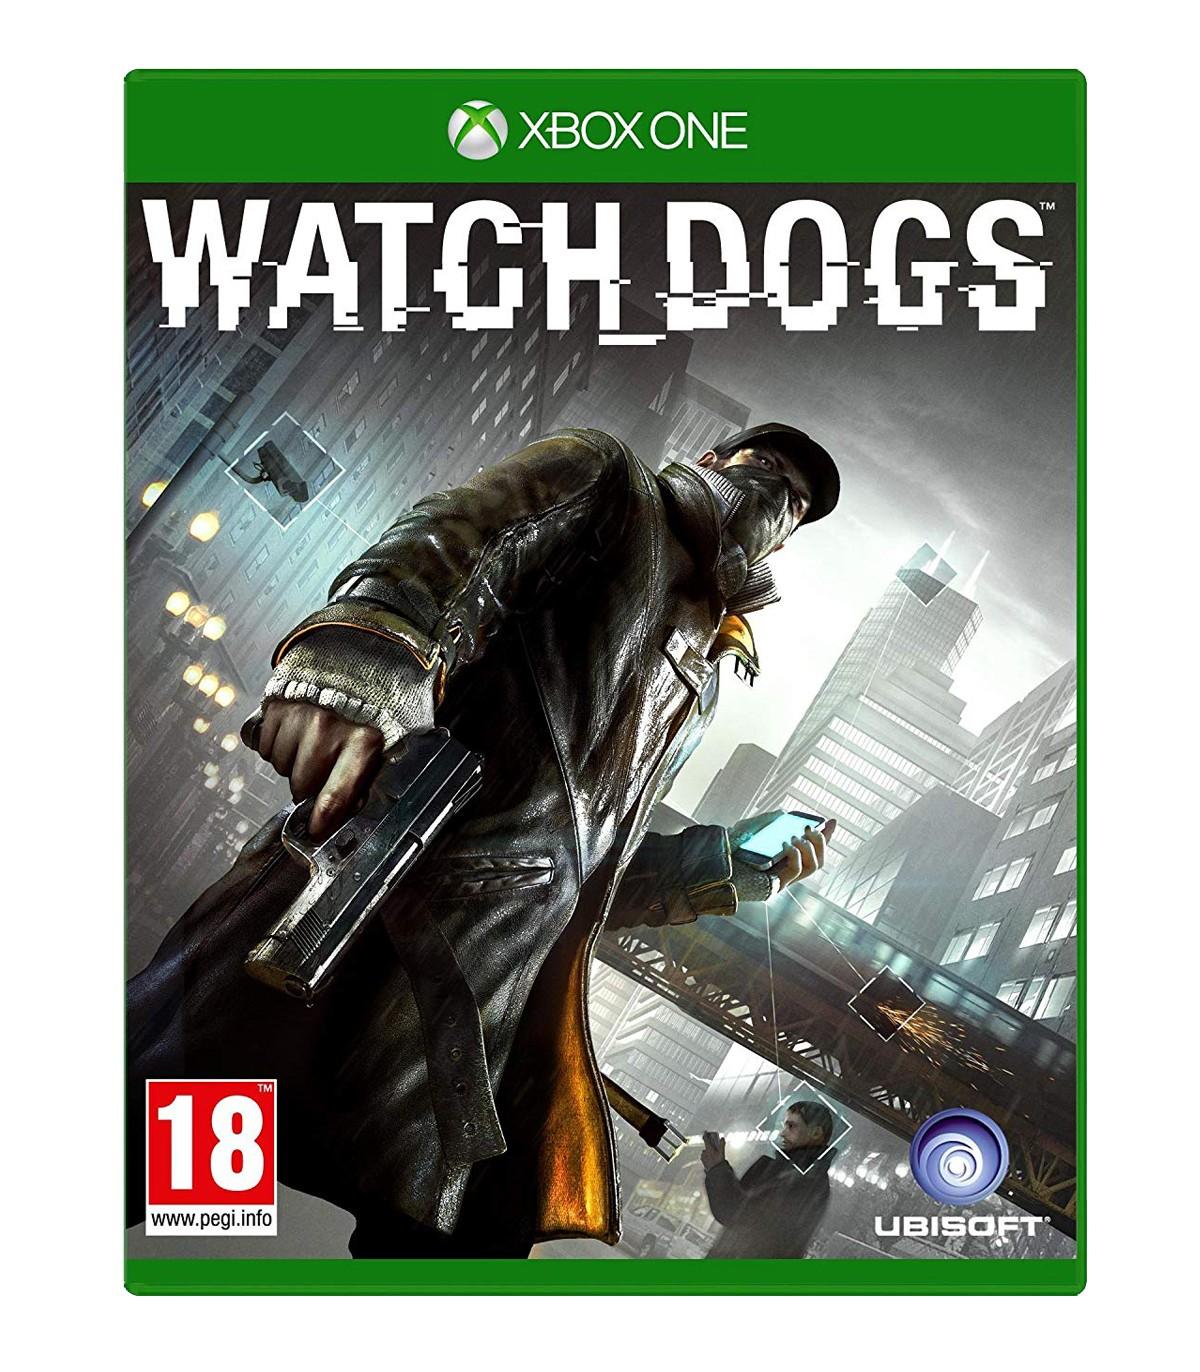 بازی Watch Dogs - ایکس باکس وان